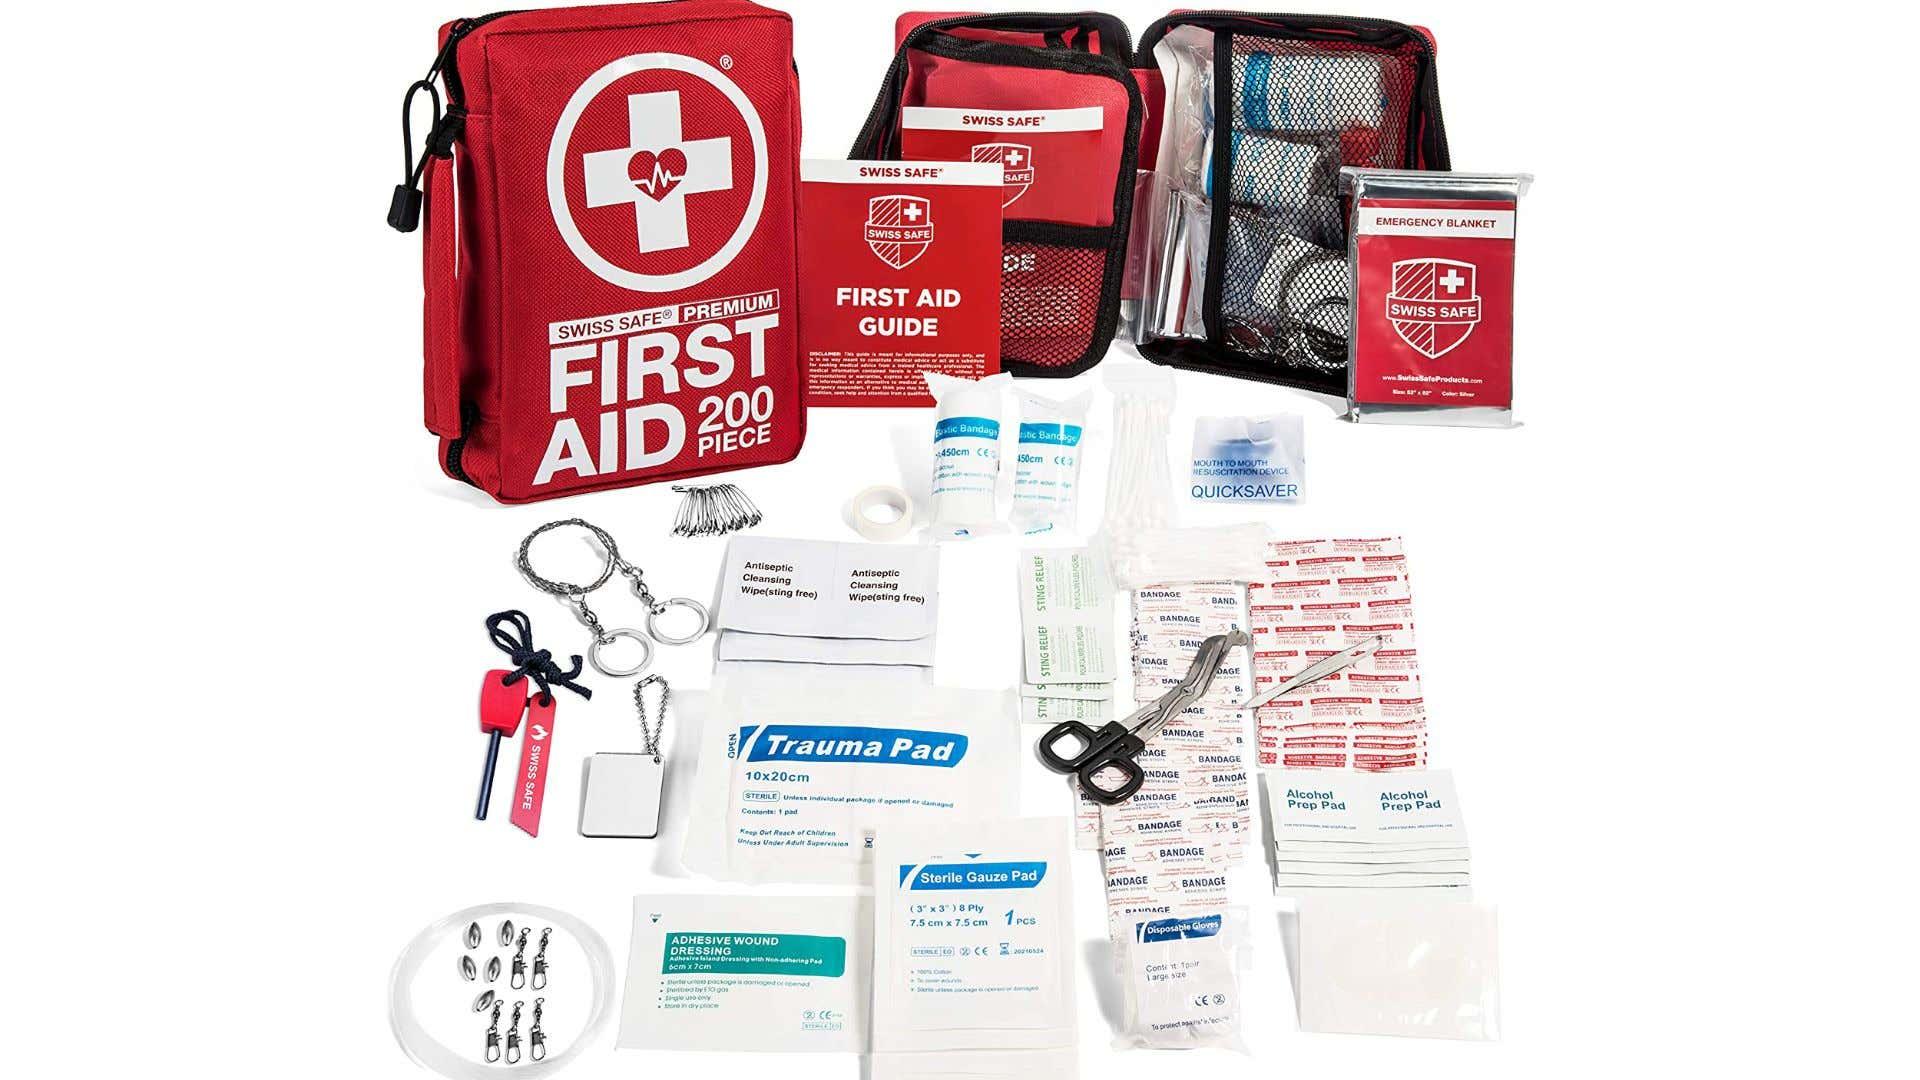 Swiss Safe First Aid Kit